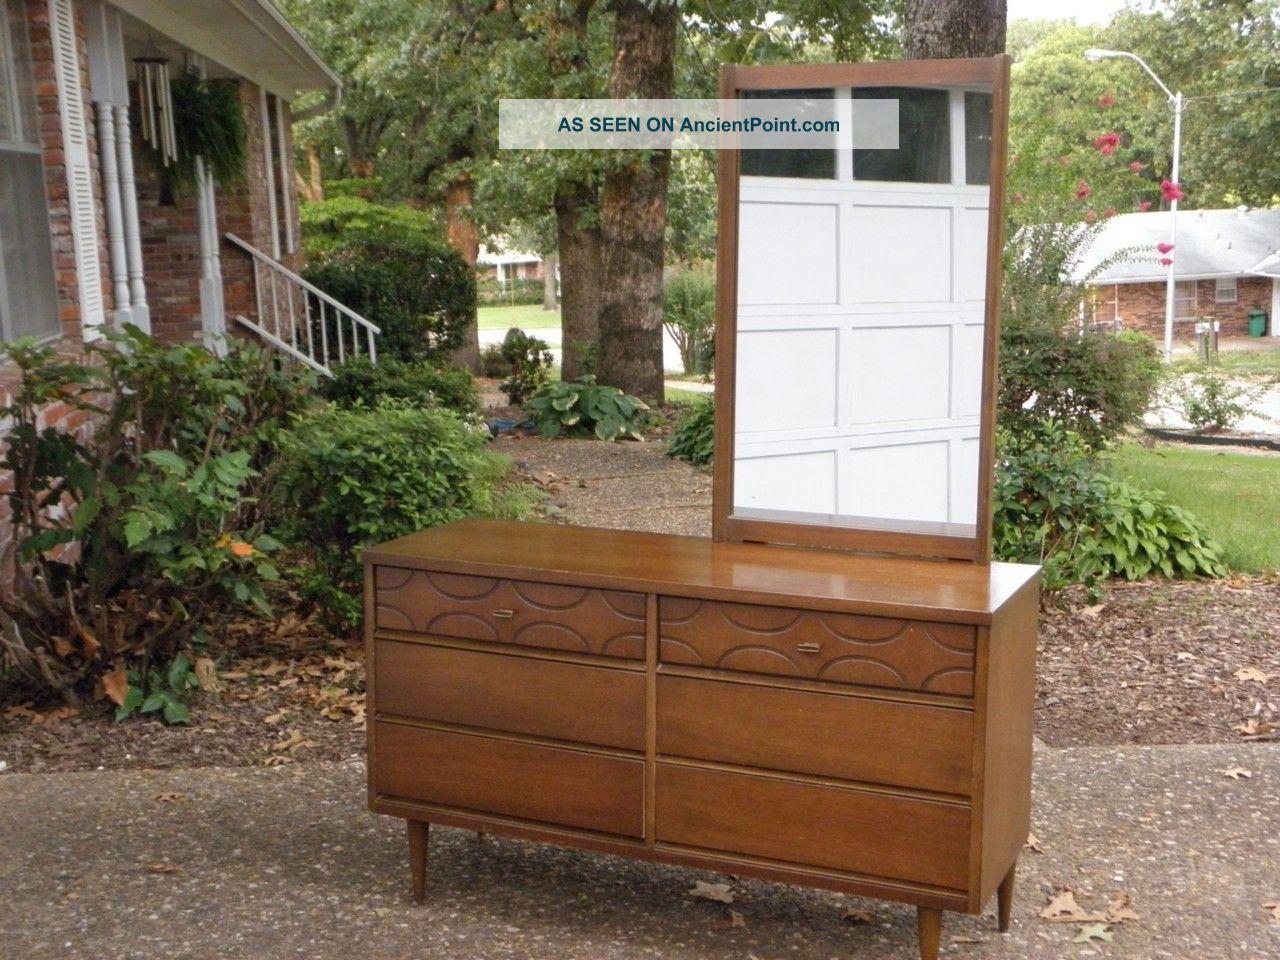 Vintage 1950s Bassett Wood Six Drawer Dresser With Mirror 1900-1950 photo